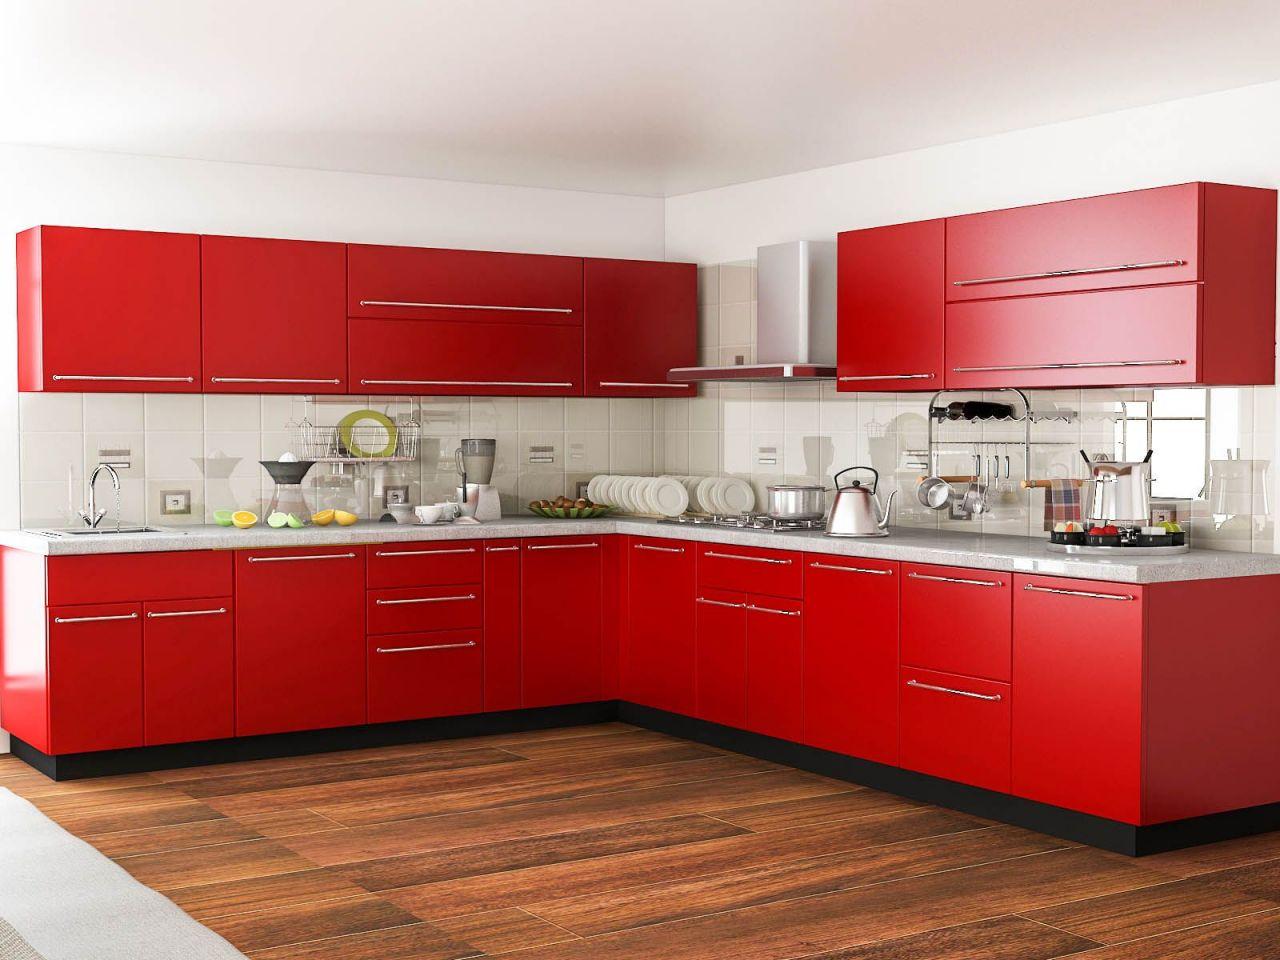 Beautiful  Modular Kitchen Design Red And White